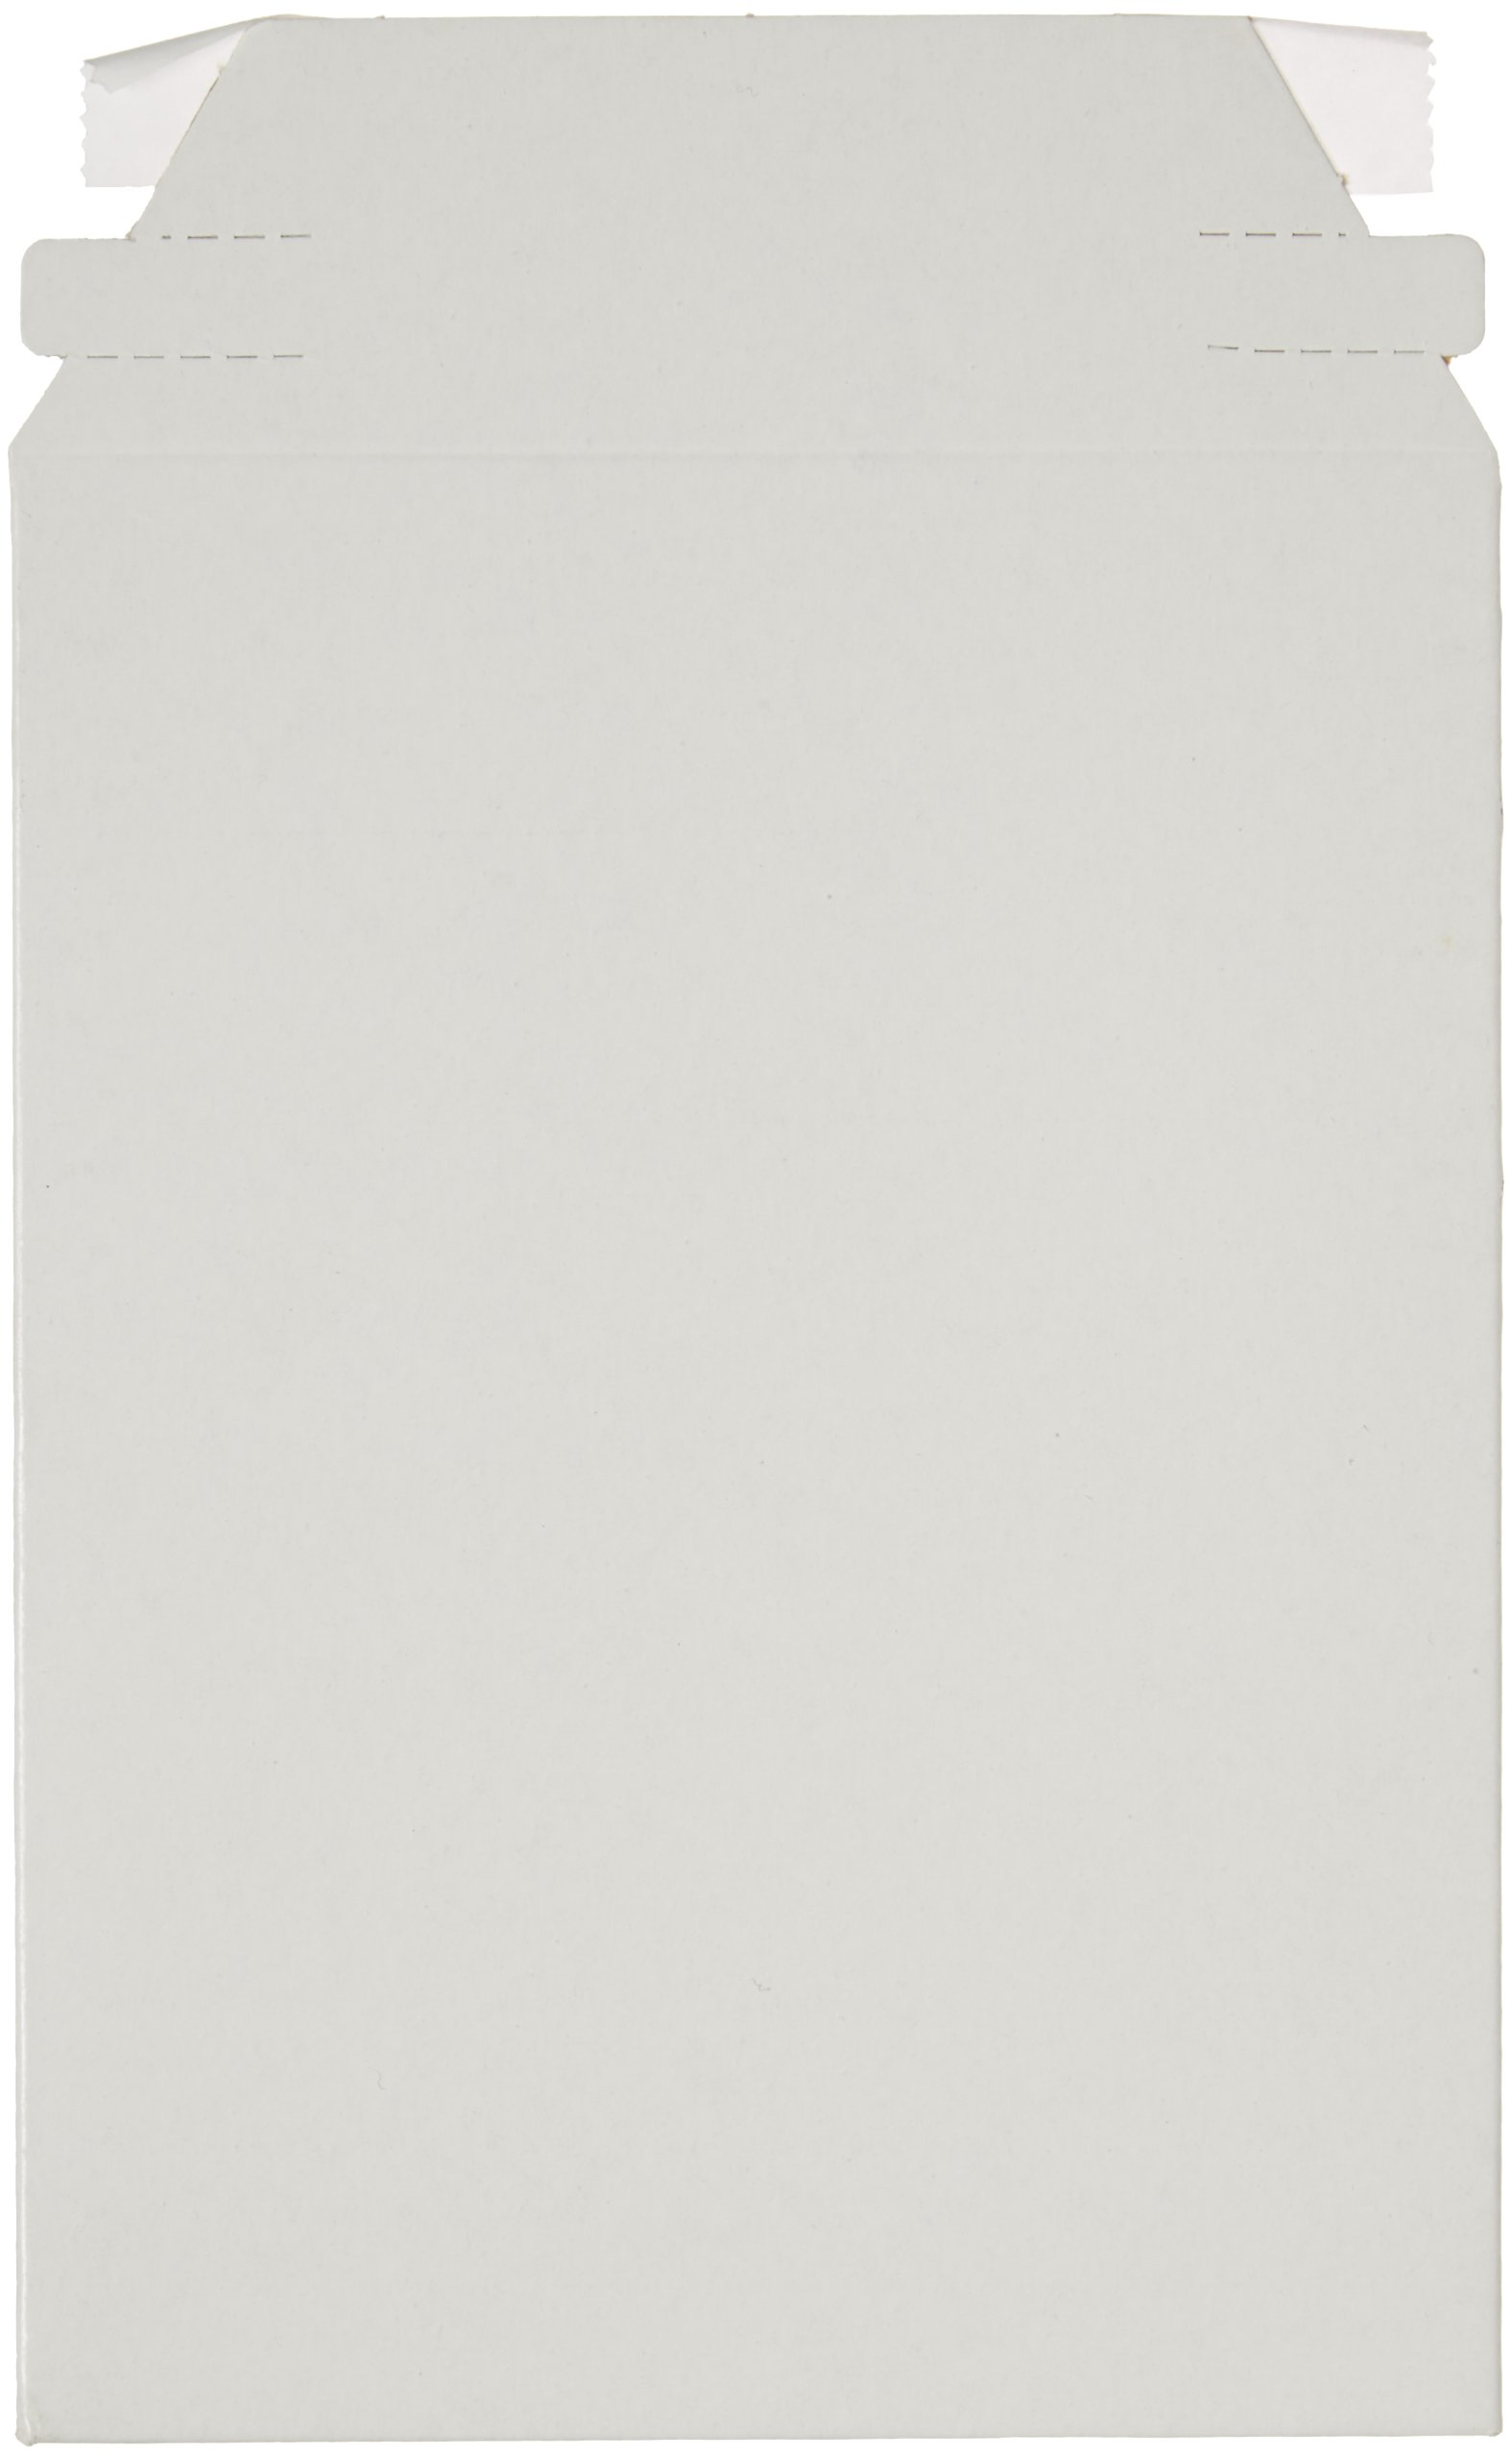 Pratt MJ-1 Self-Seal Stay Flat Mailer, White, 6'' x 8'' (Pack of 100)